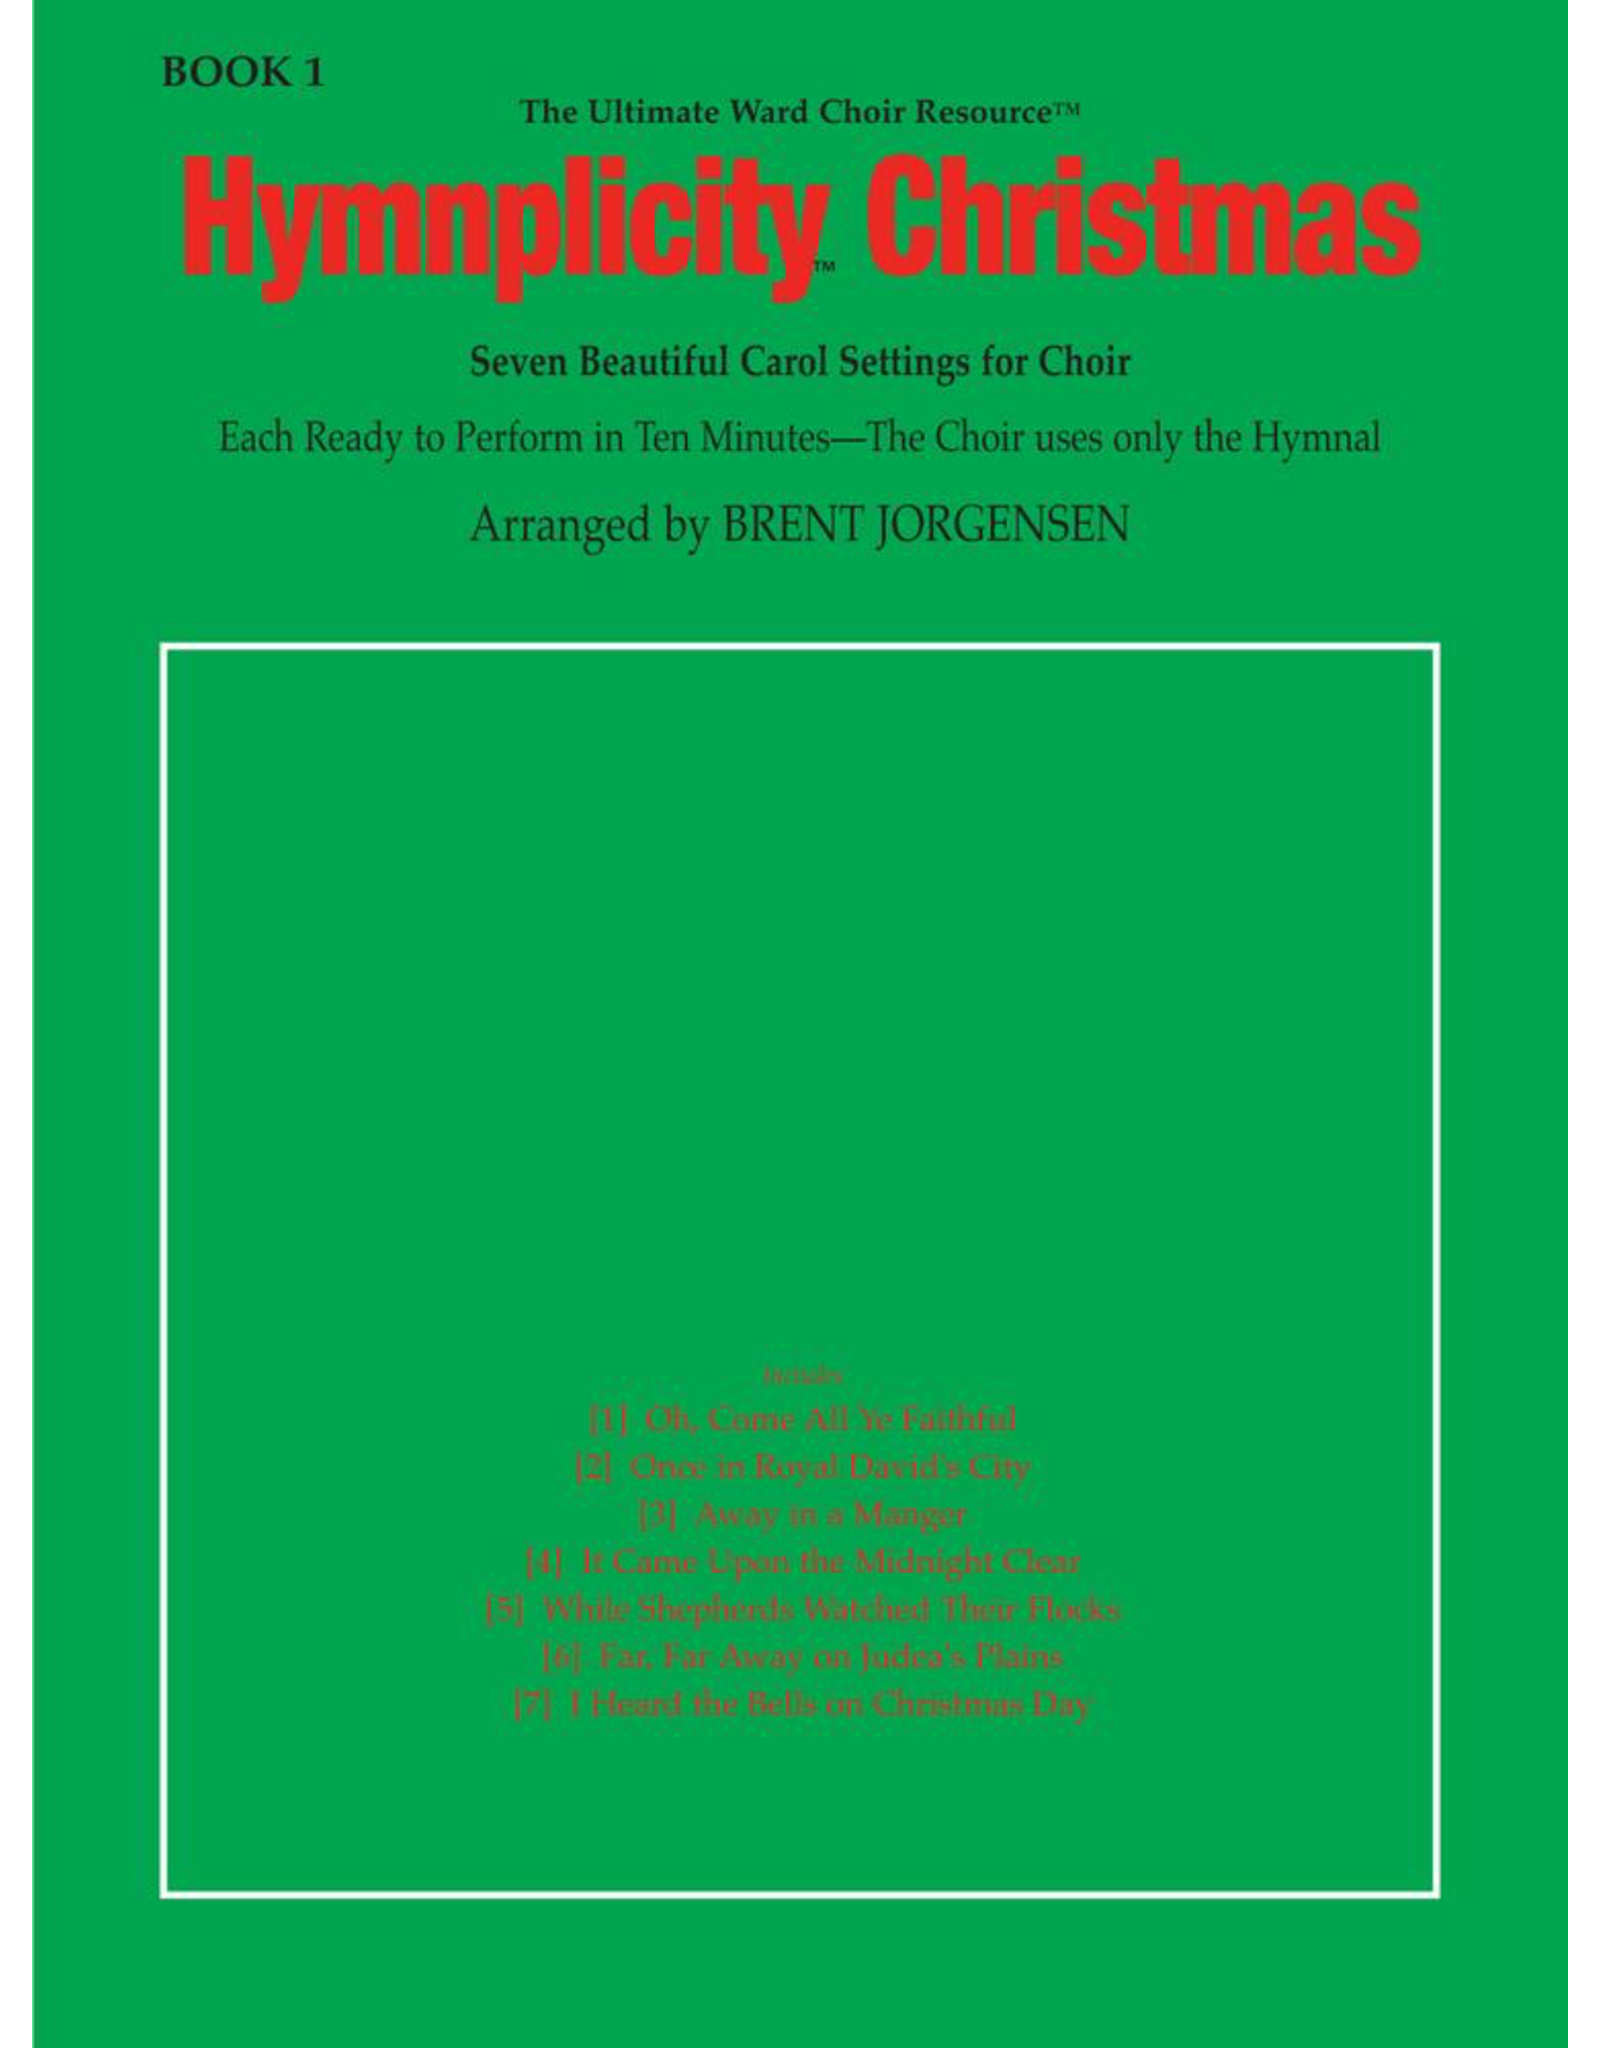 Jackman Music Hymnplicity Christmas, Book 1